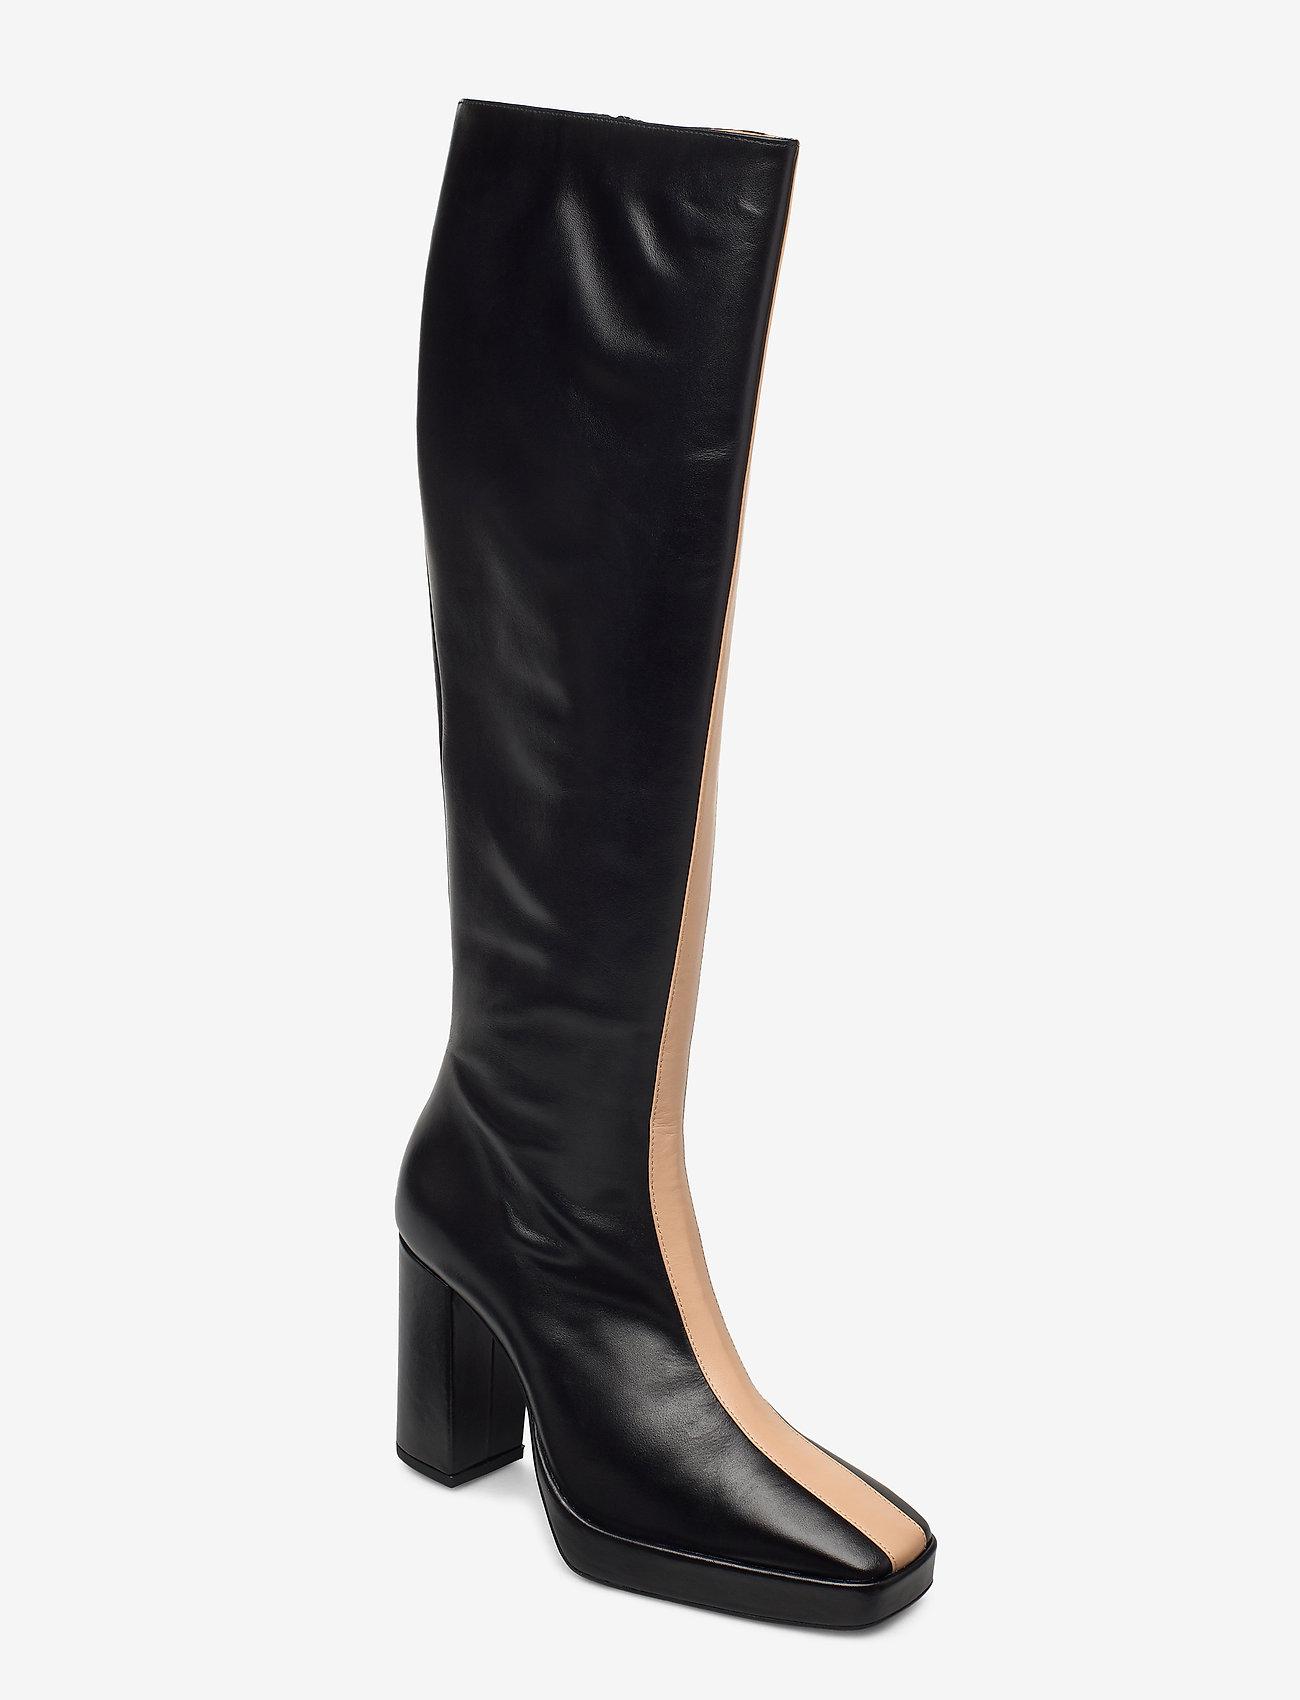 ANNY NORD - CROSSING THE LINE Tall boot - lange laarzen - black / beige combo - 0